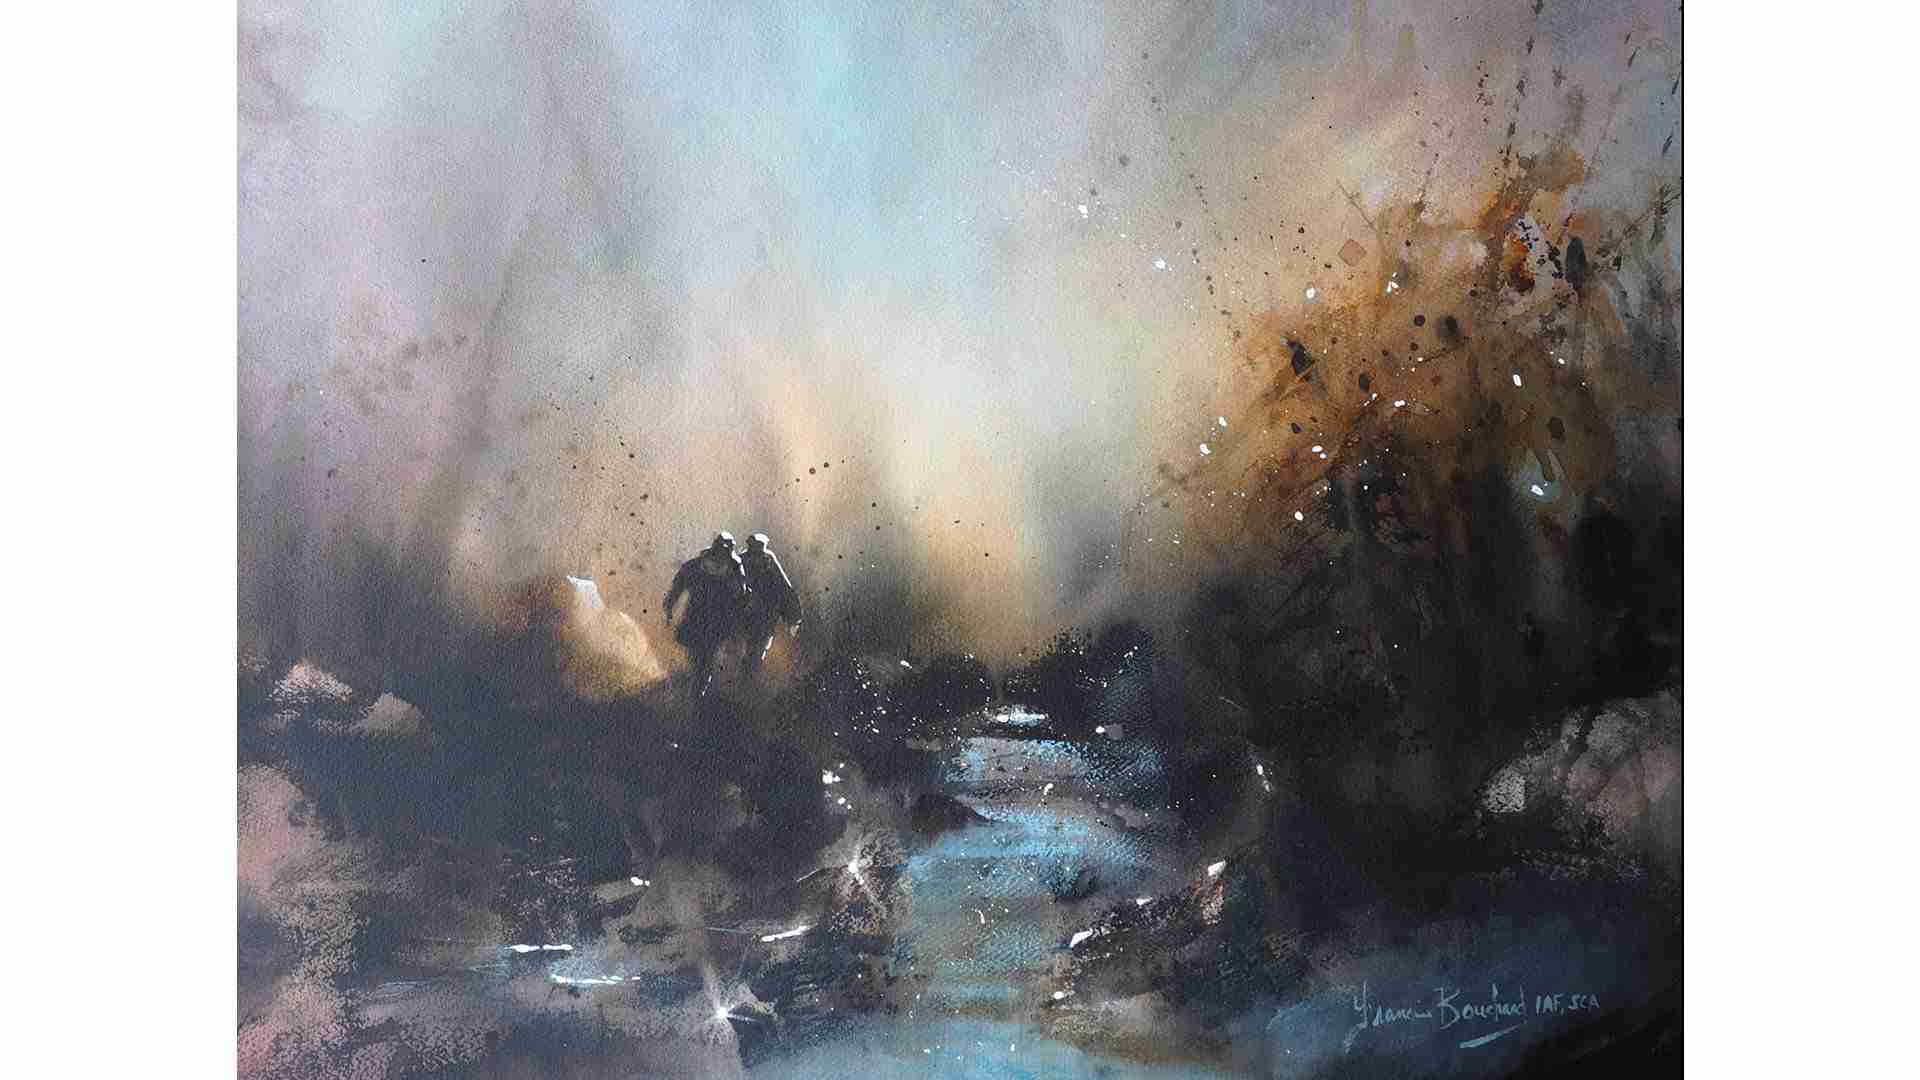 Francine Bouchard Artiste Peintre - Hatley